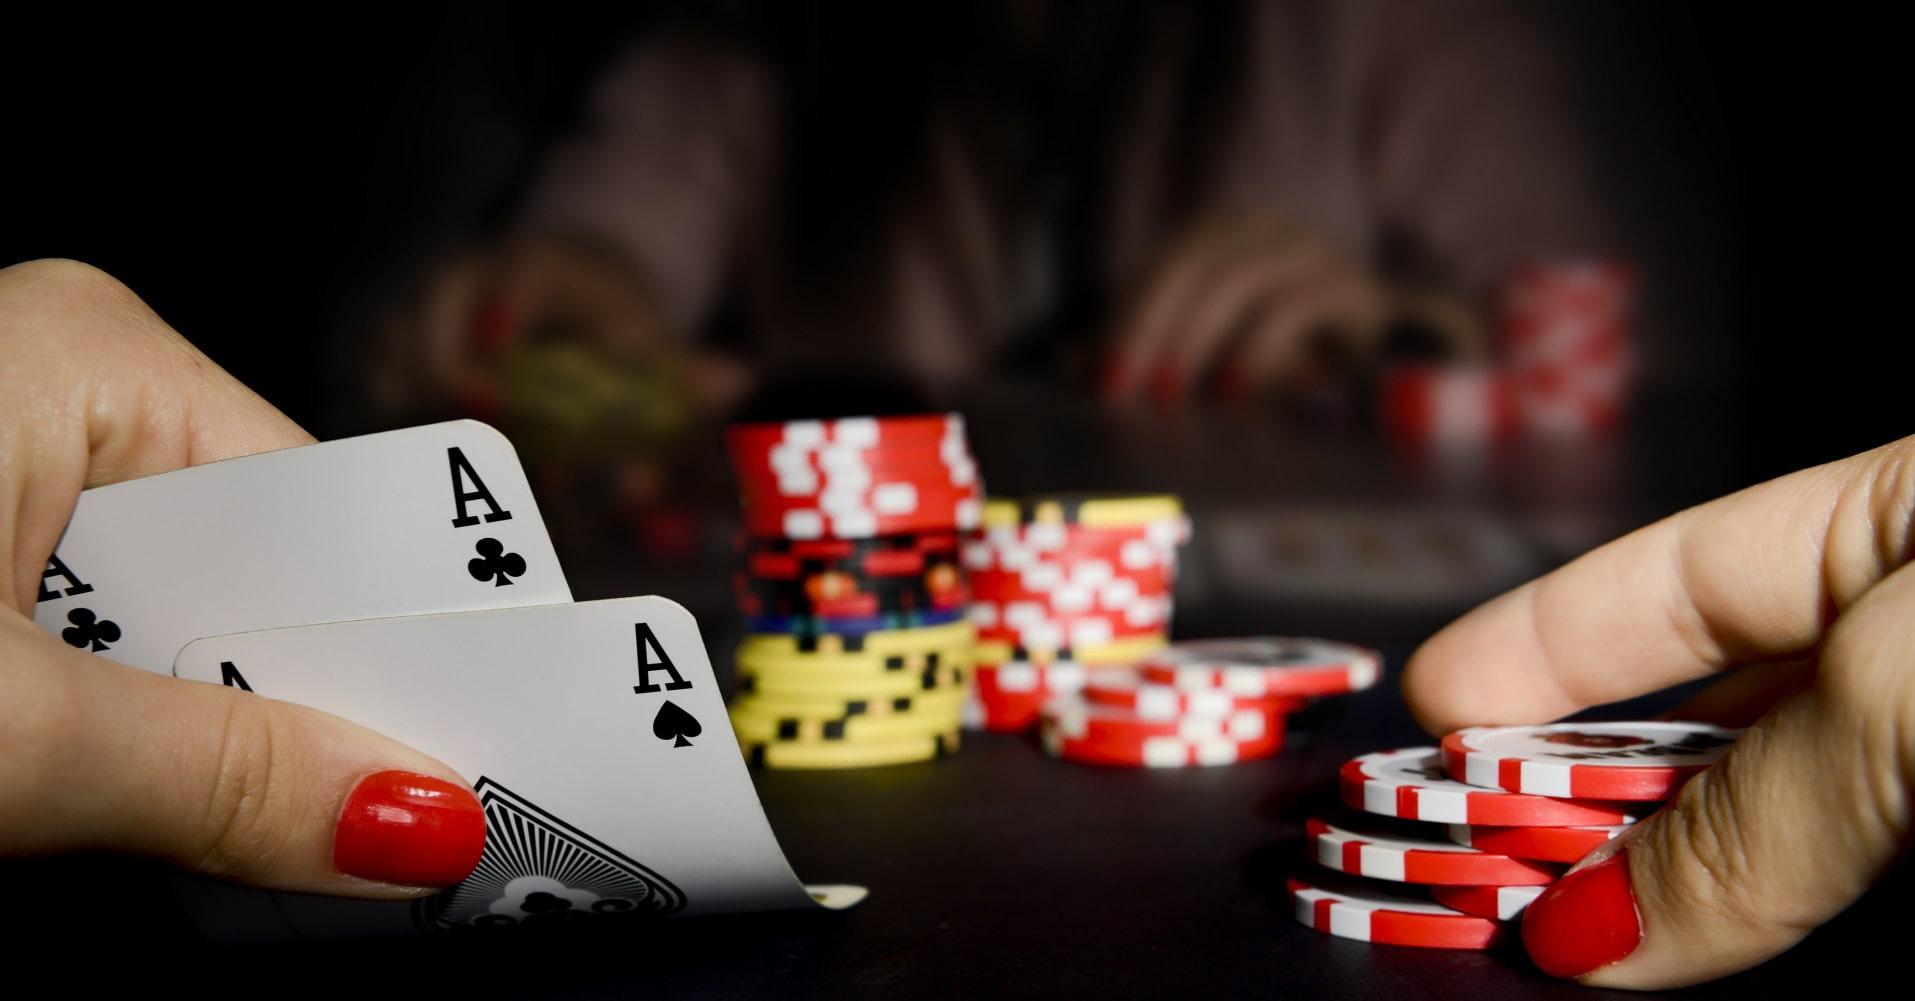 karty-kazino-poker-min.jpg